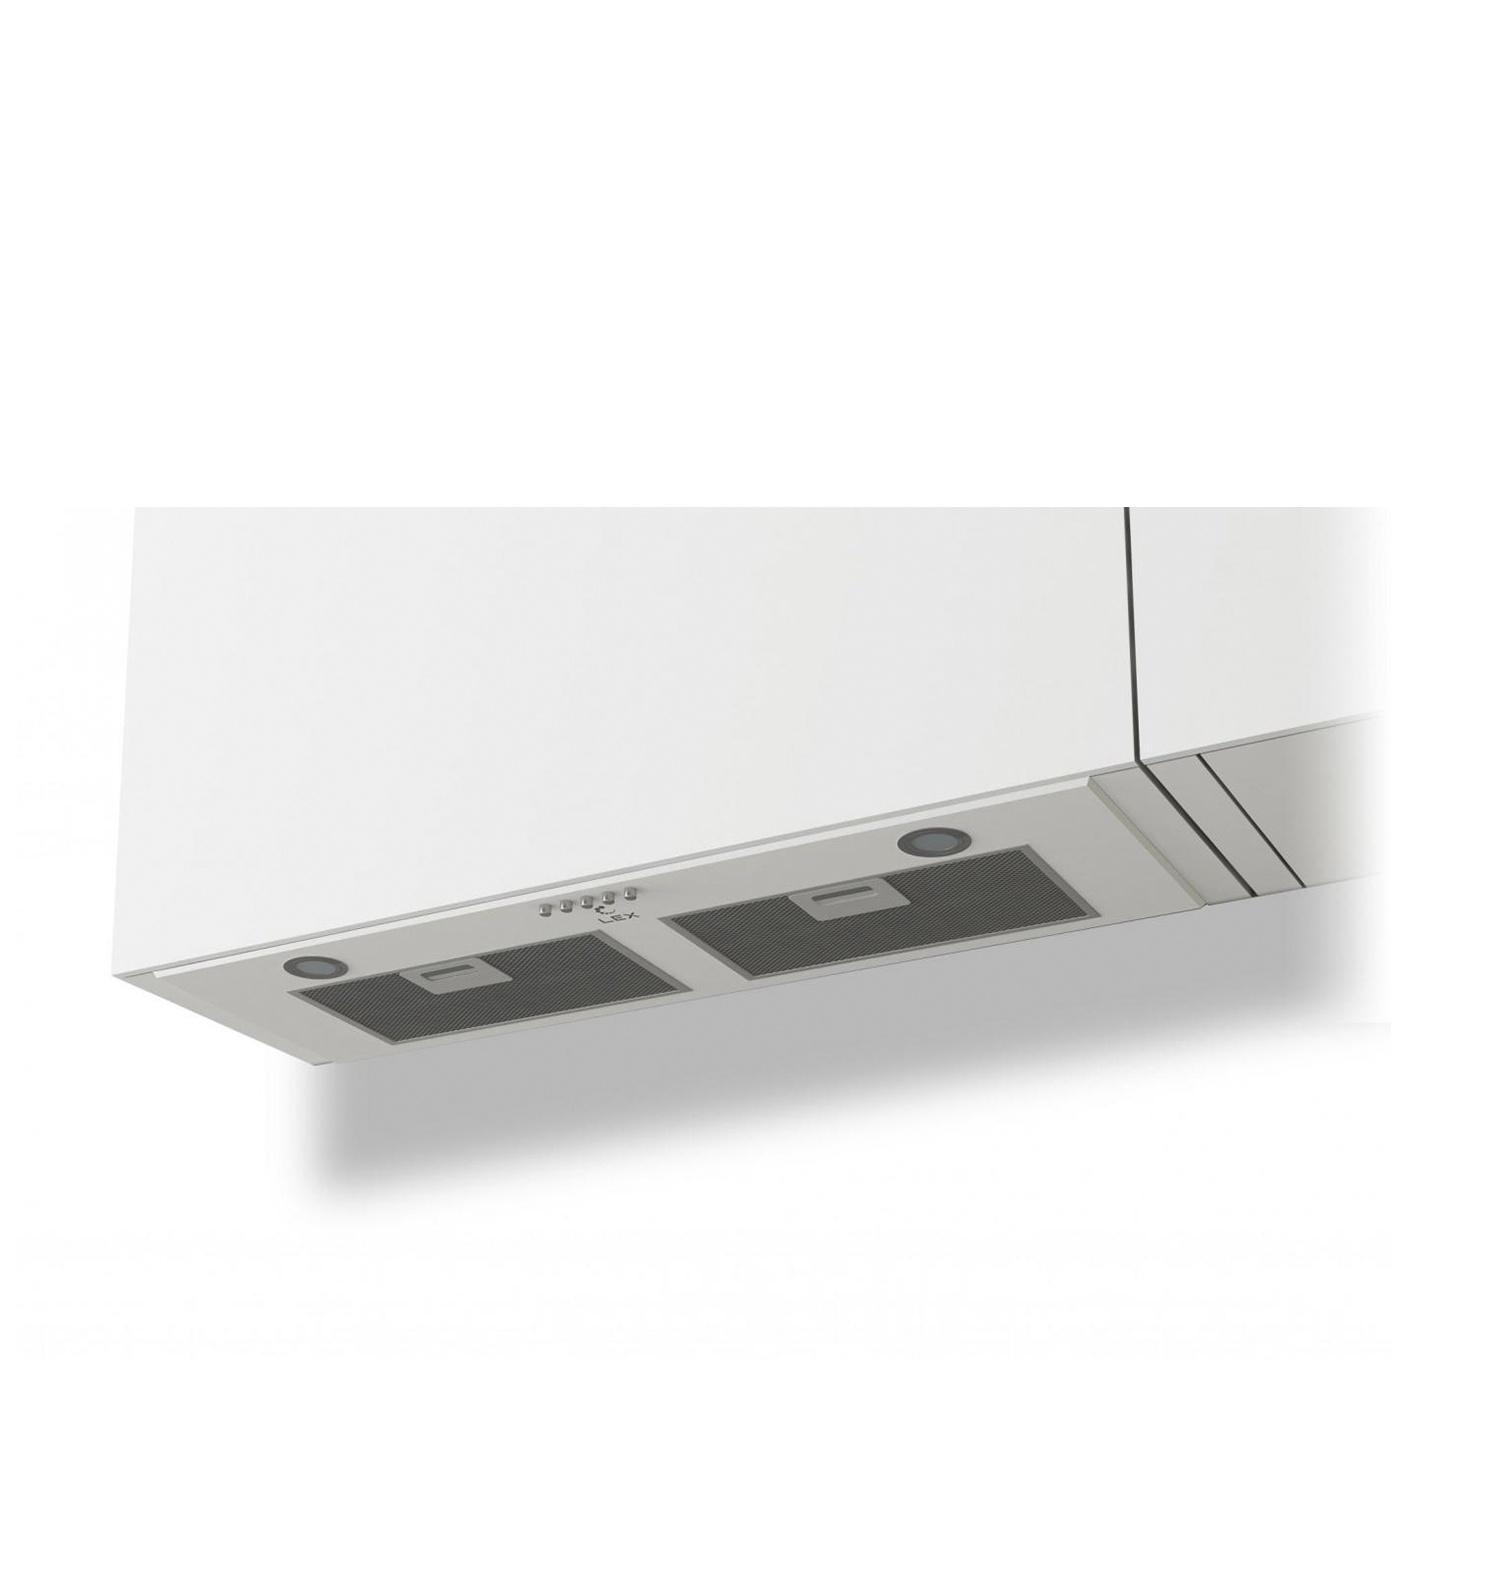 Встраиваемая кухонная вытяжка LEX GS BLOC P 900 White